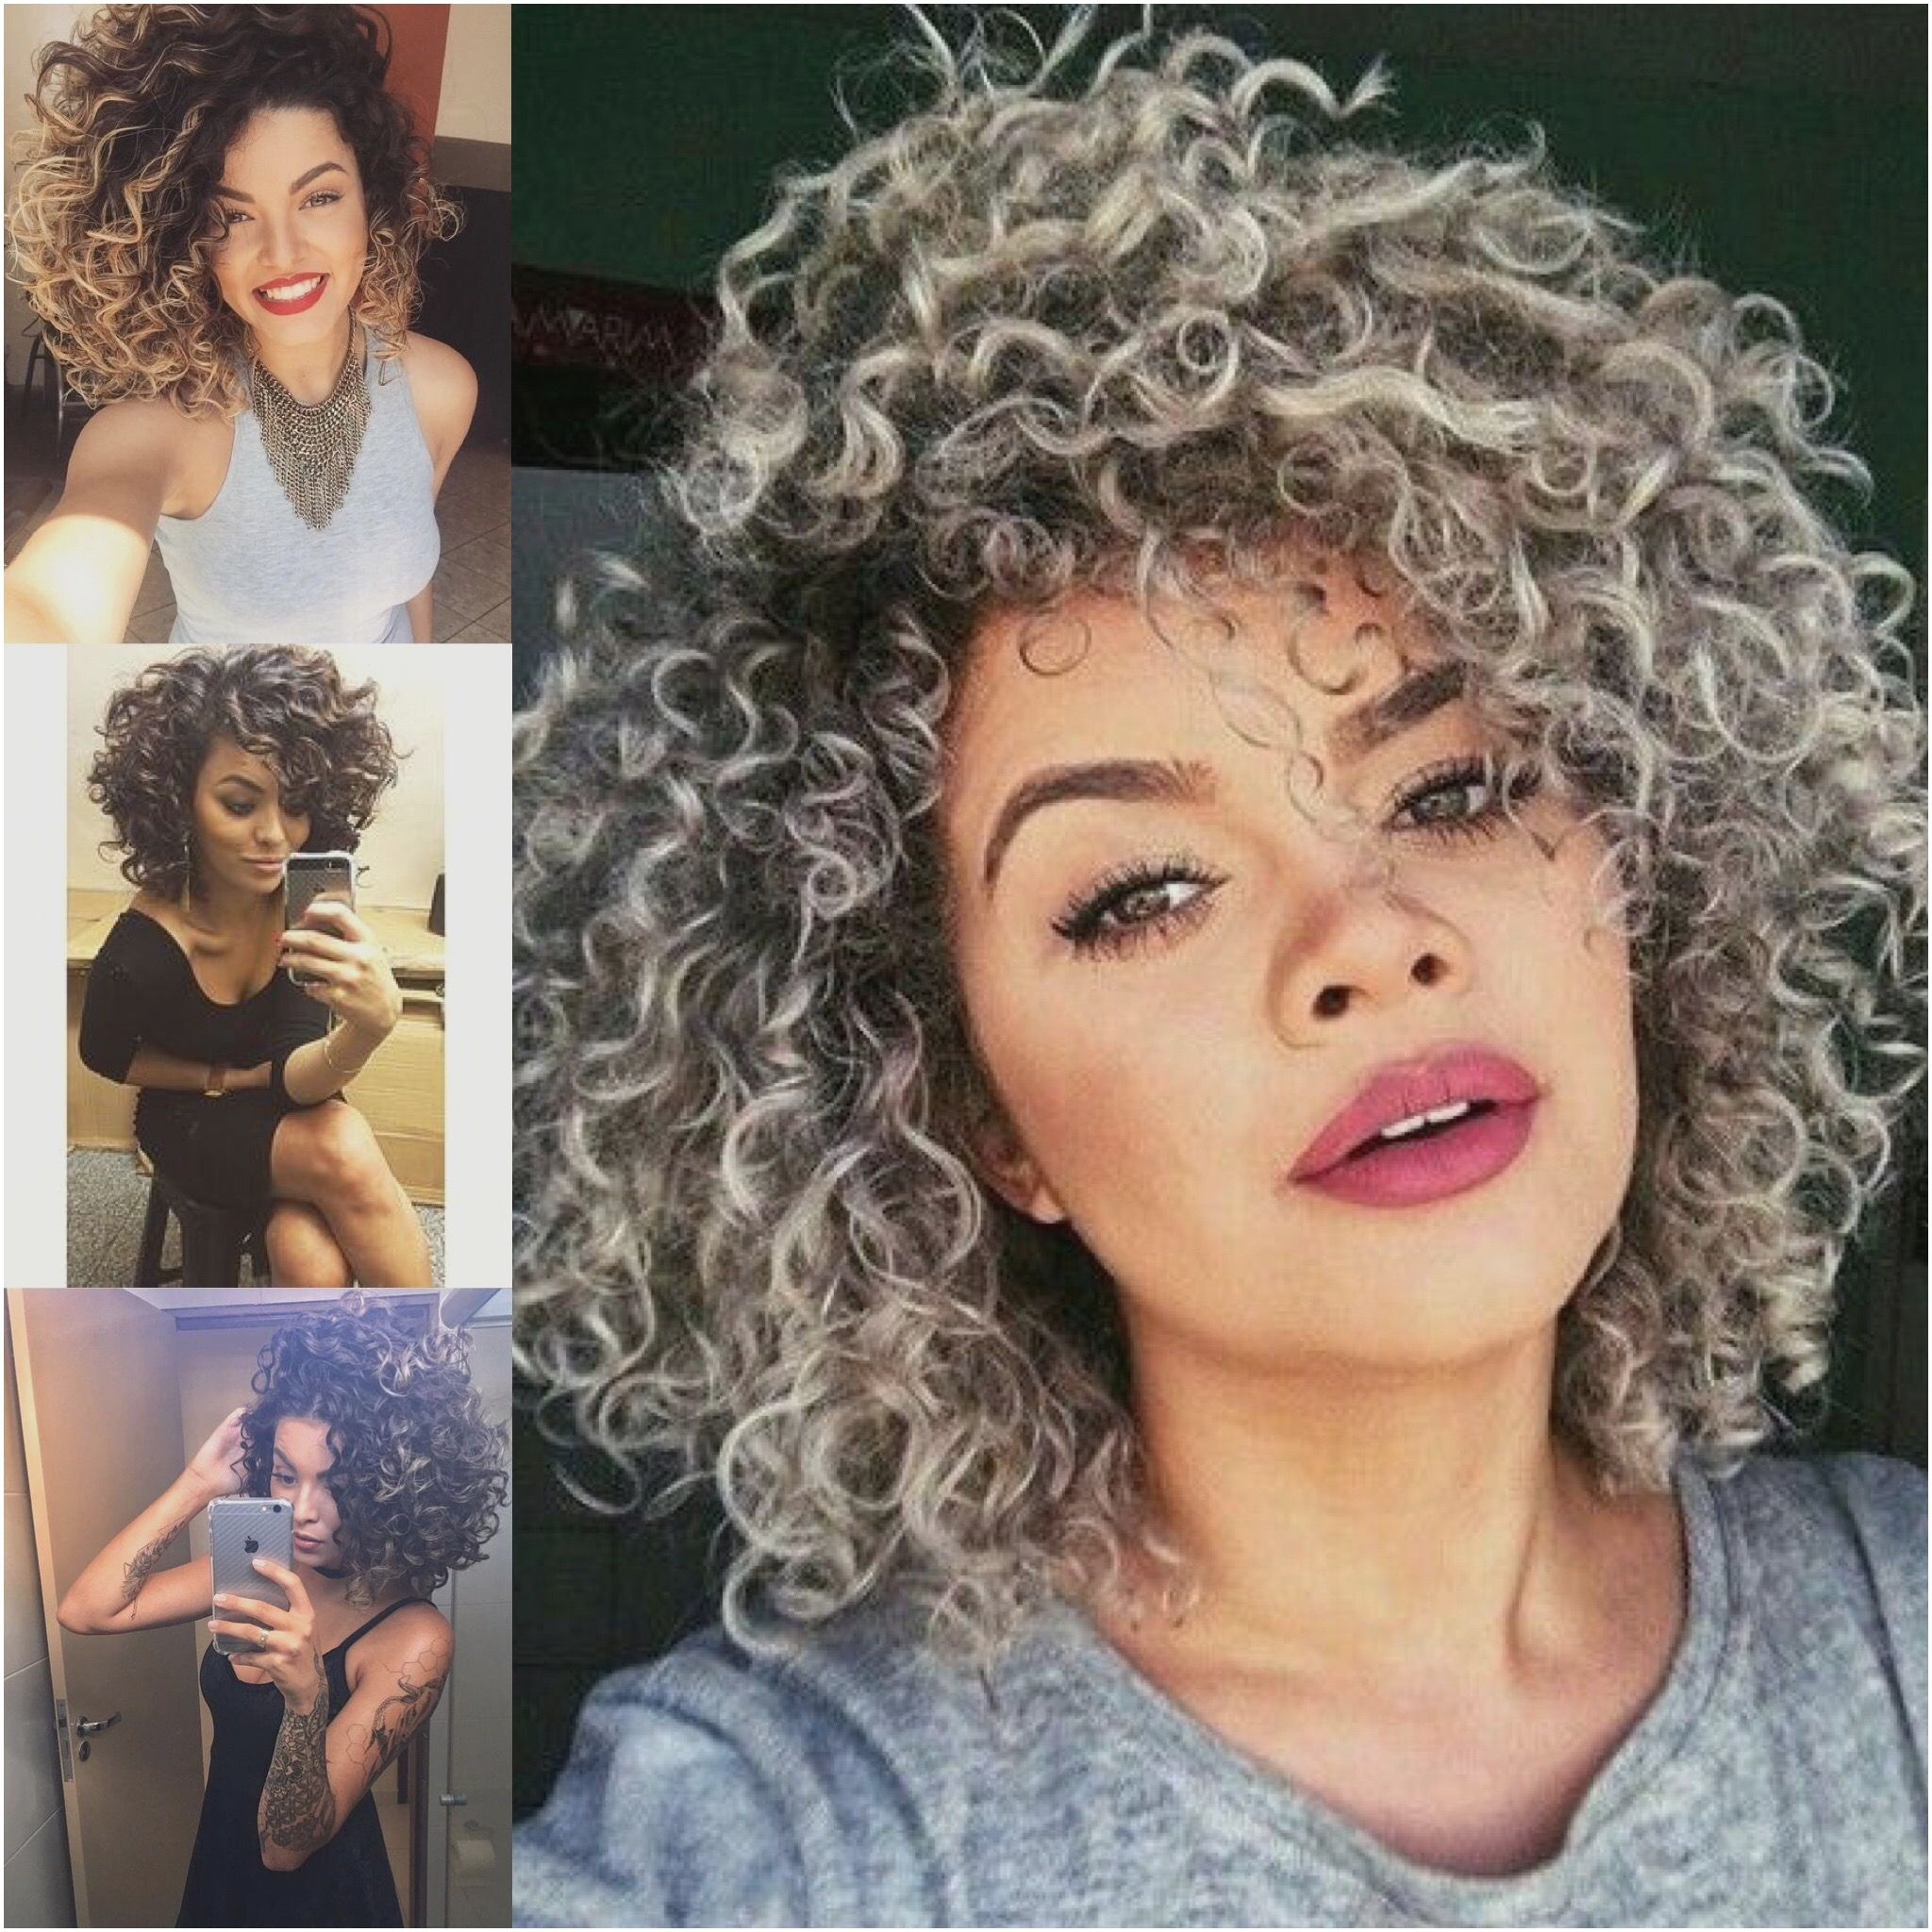 Elegante peinados rizados Galeria De Cortes De Pelo Tendencias - 55 Peinados Rizados Cortos Naturales 2019 | Hair styles ...